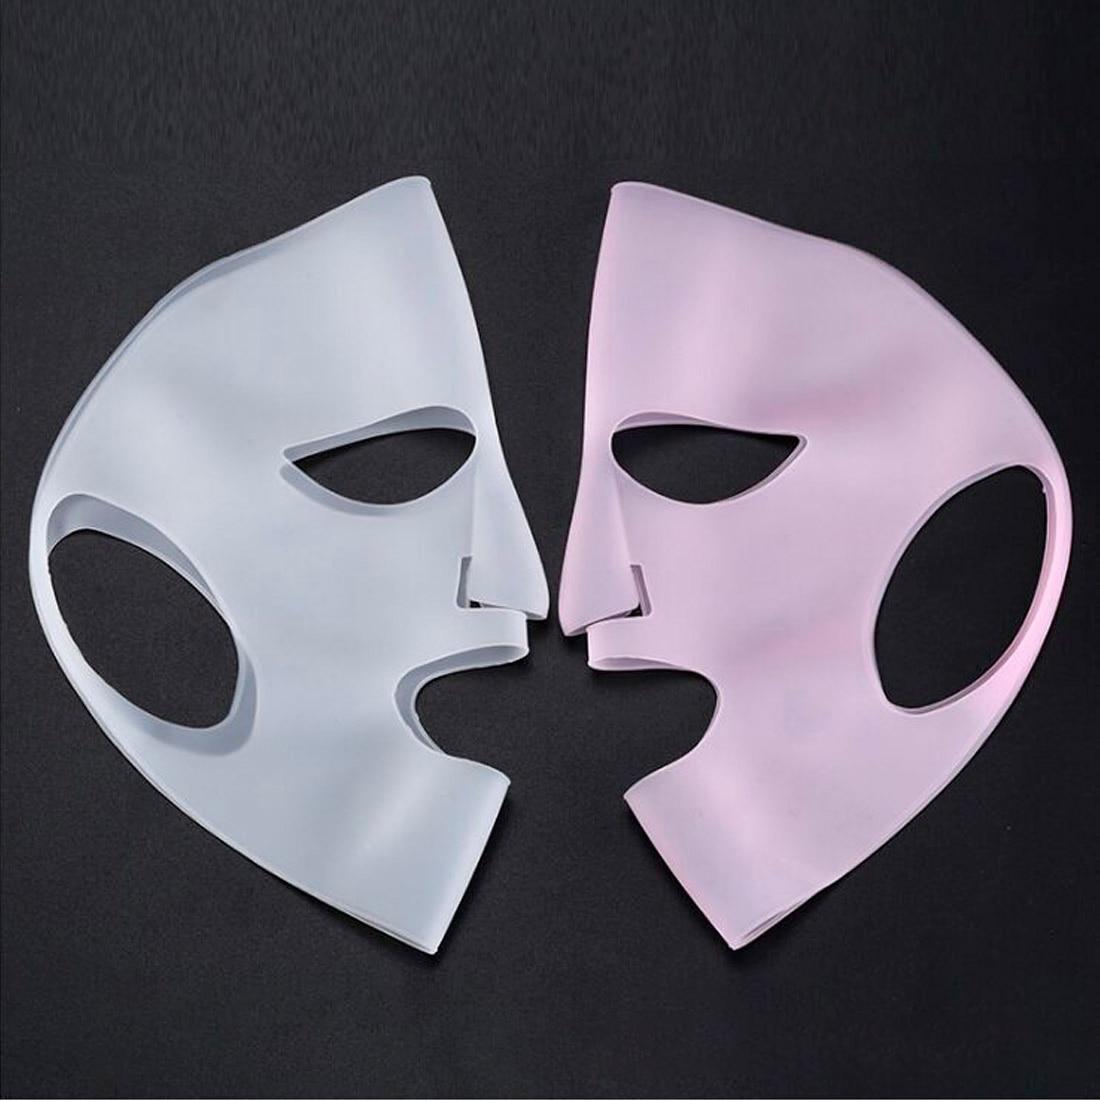 Reusable Grace Face Mask Cover Holder For Face Mask Steam Prevents Evaporation Moisturizing Control Blackhead Remover